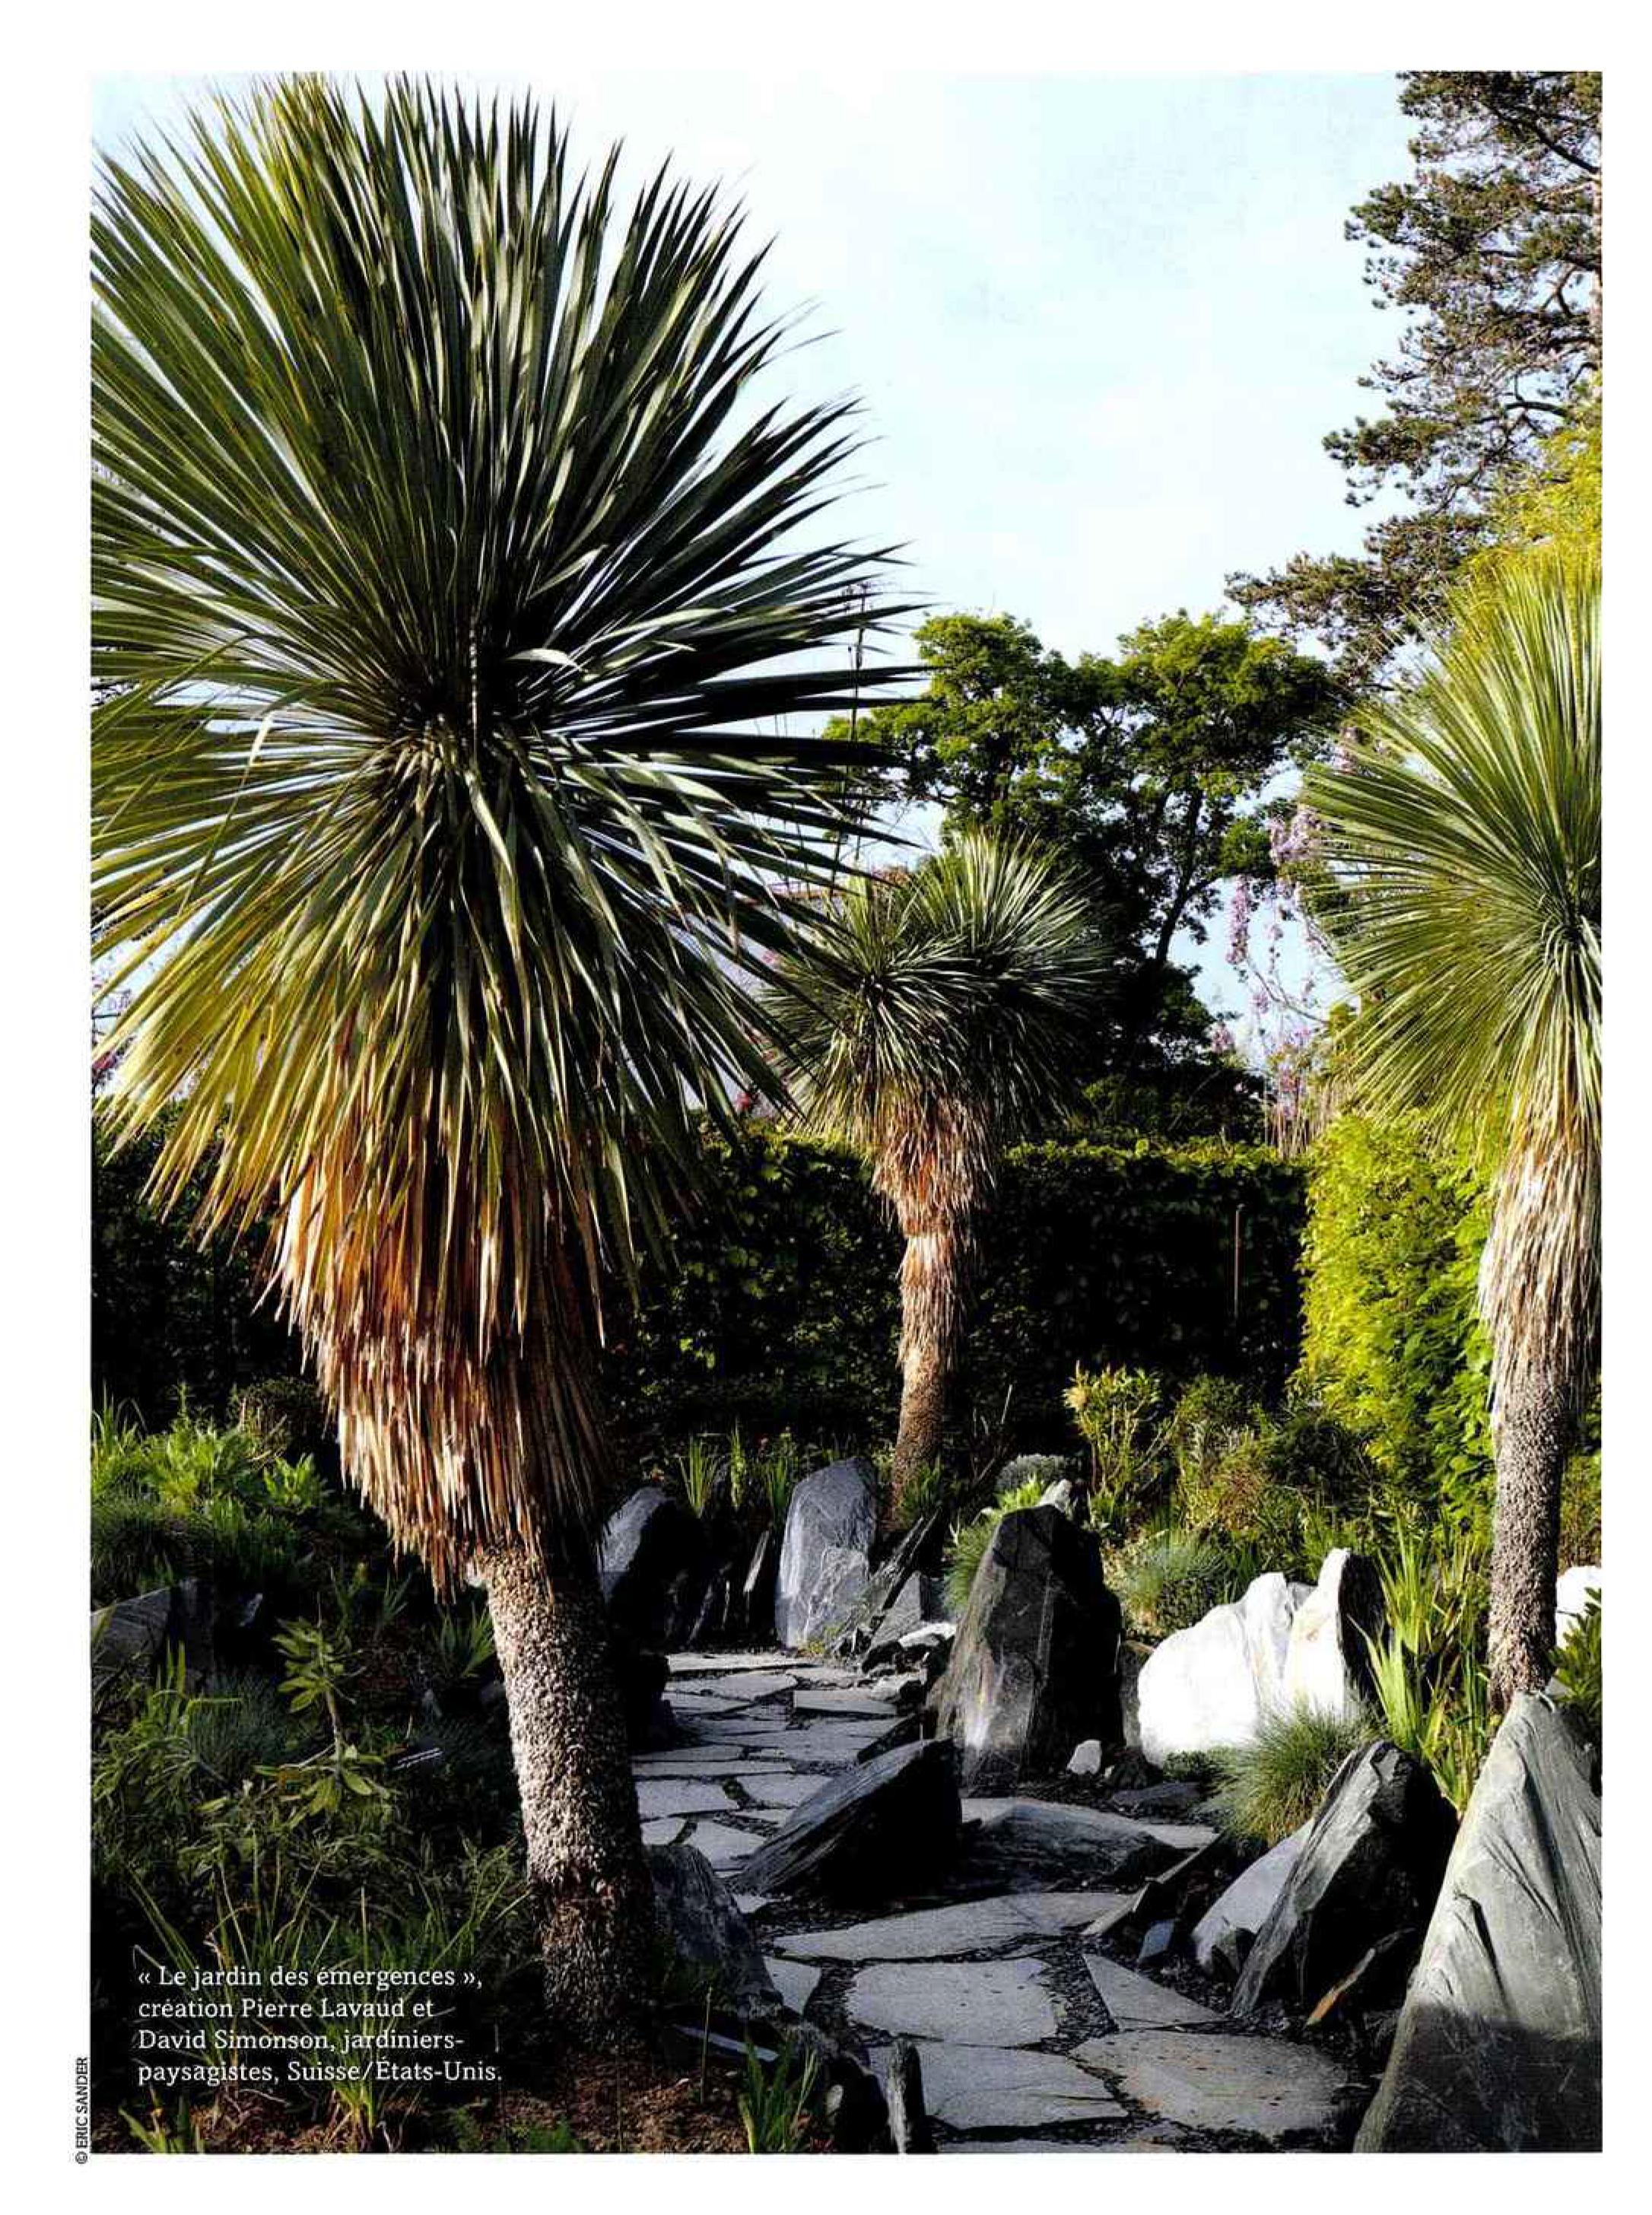 ExterieurDesignMagazine-30062016-2-Simonson-Landscape.jpg